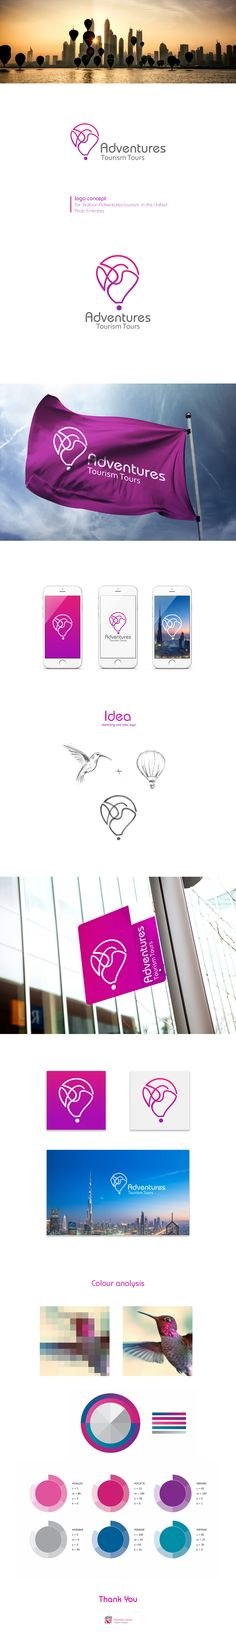 Adventure logo on Behance